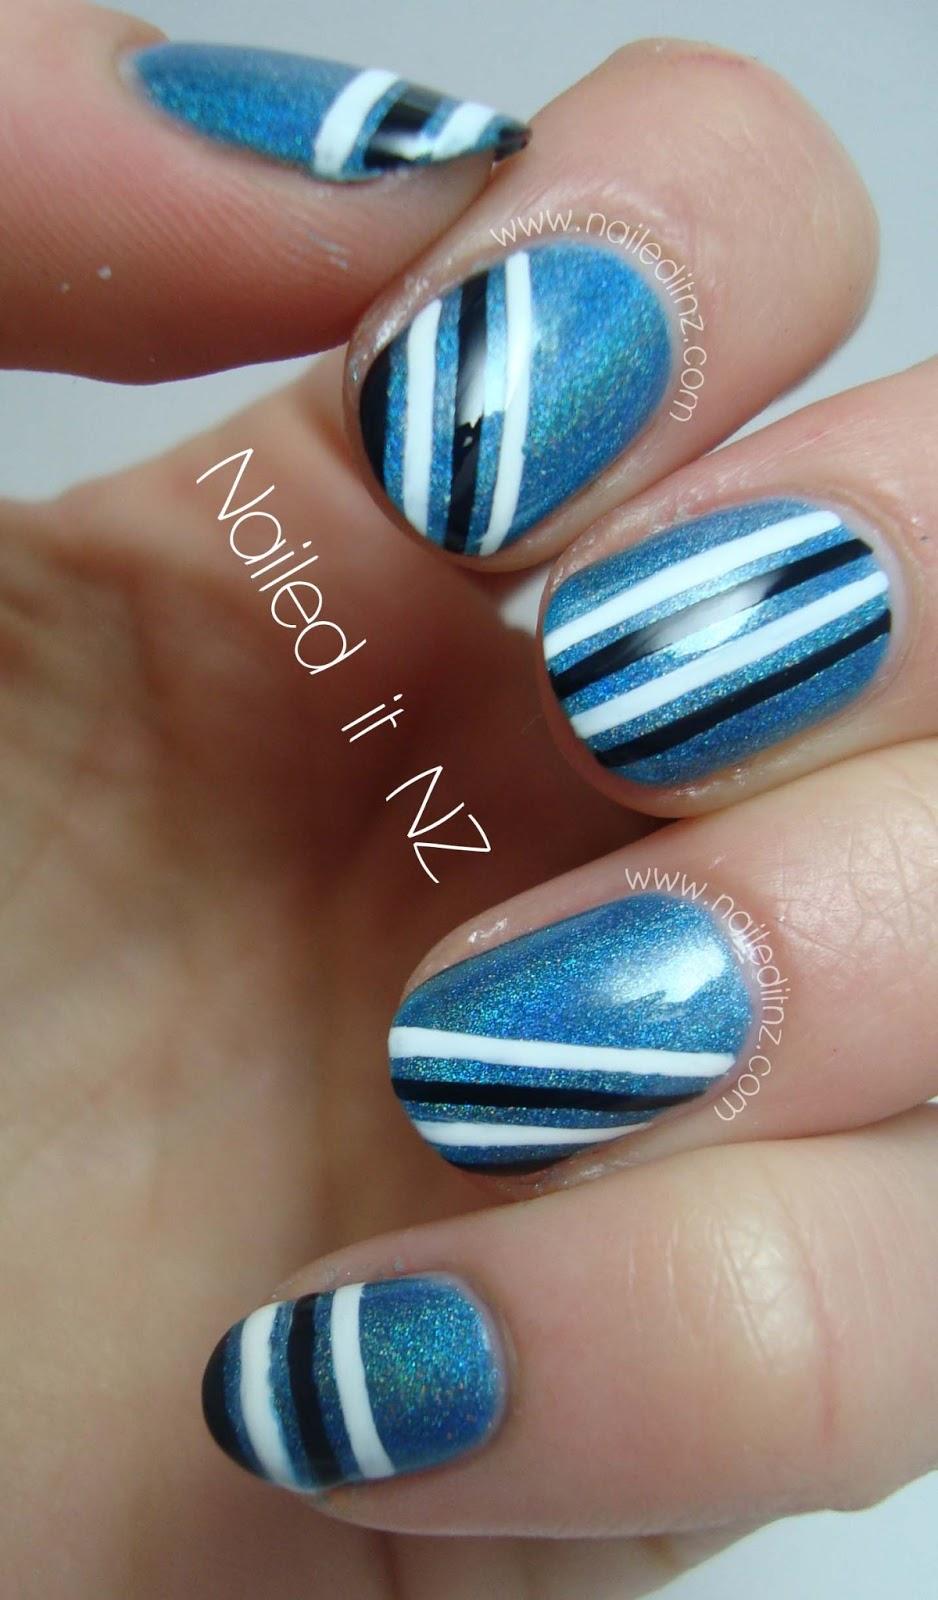 BPS Holographic nail polish - #8 Bright Blue